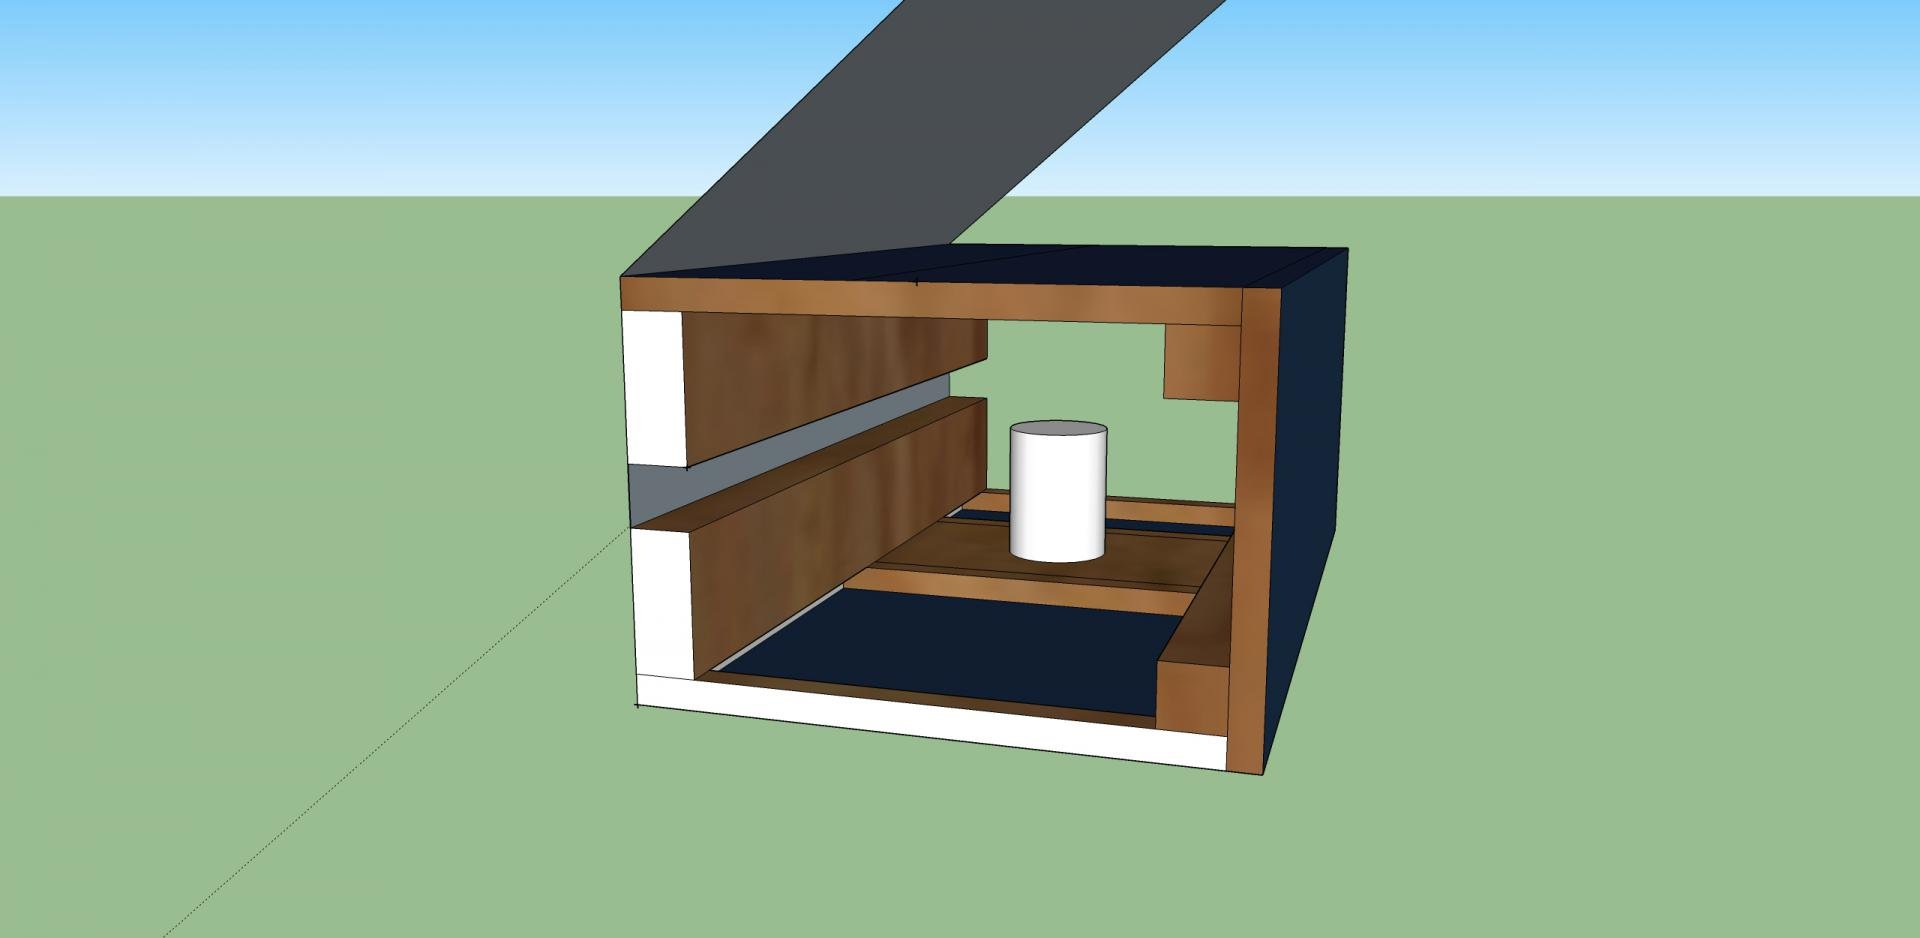 Click image for larger version  Name:soffit build 1.jpg Views:50 Size:64.3 KB ID:1760041